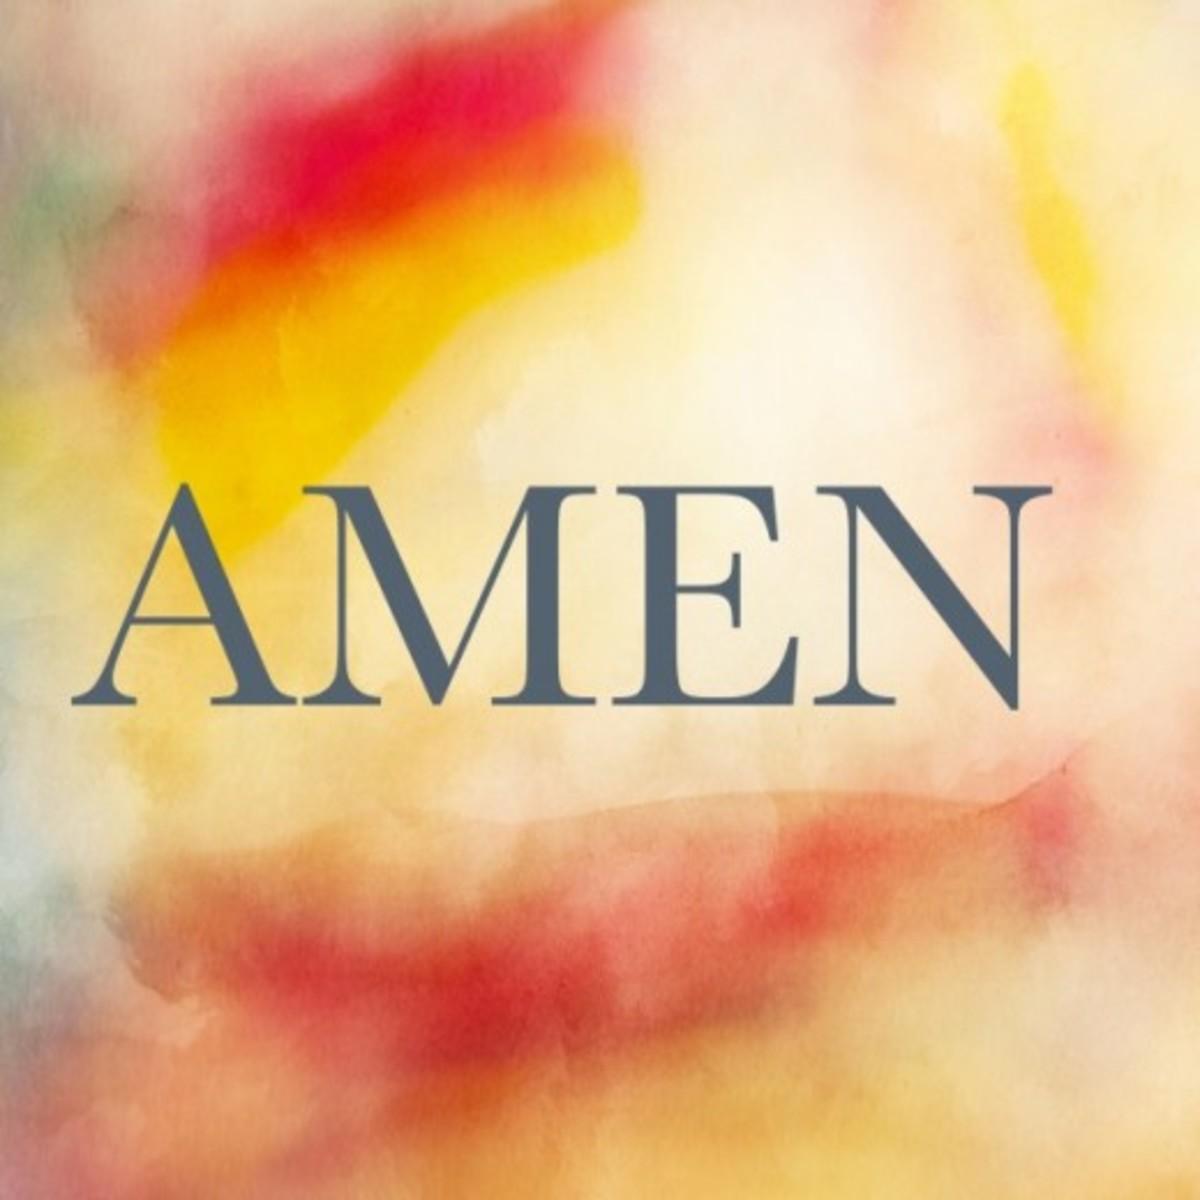 amen-bible-word-study